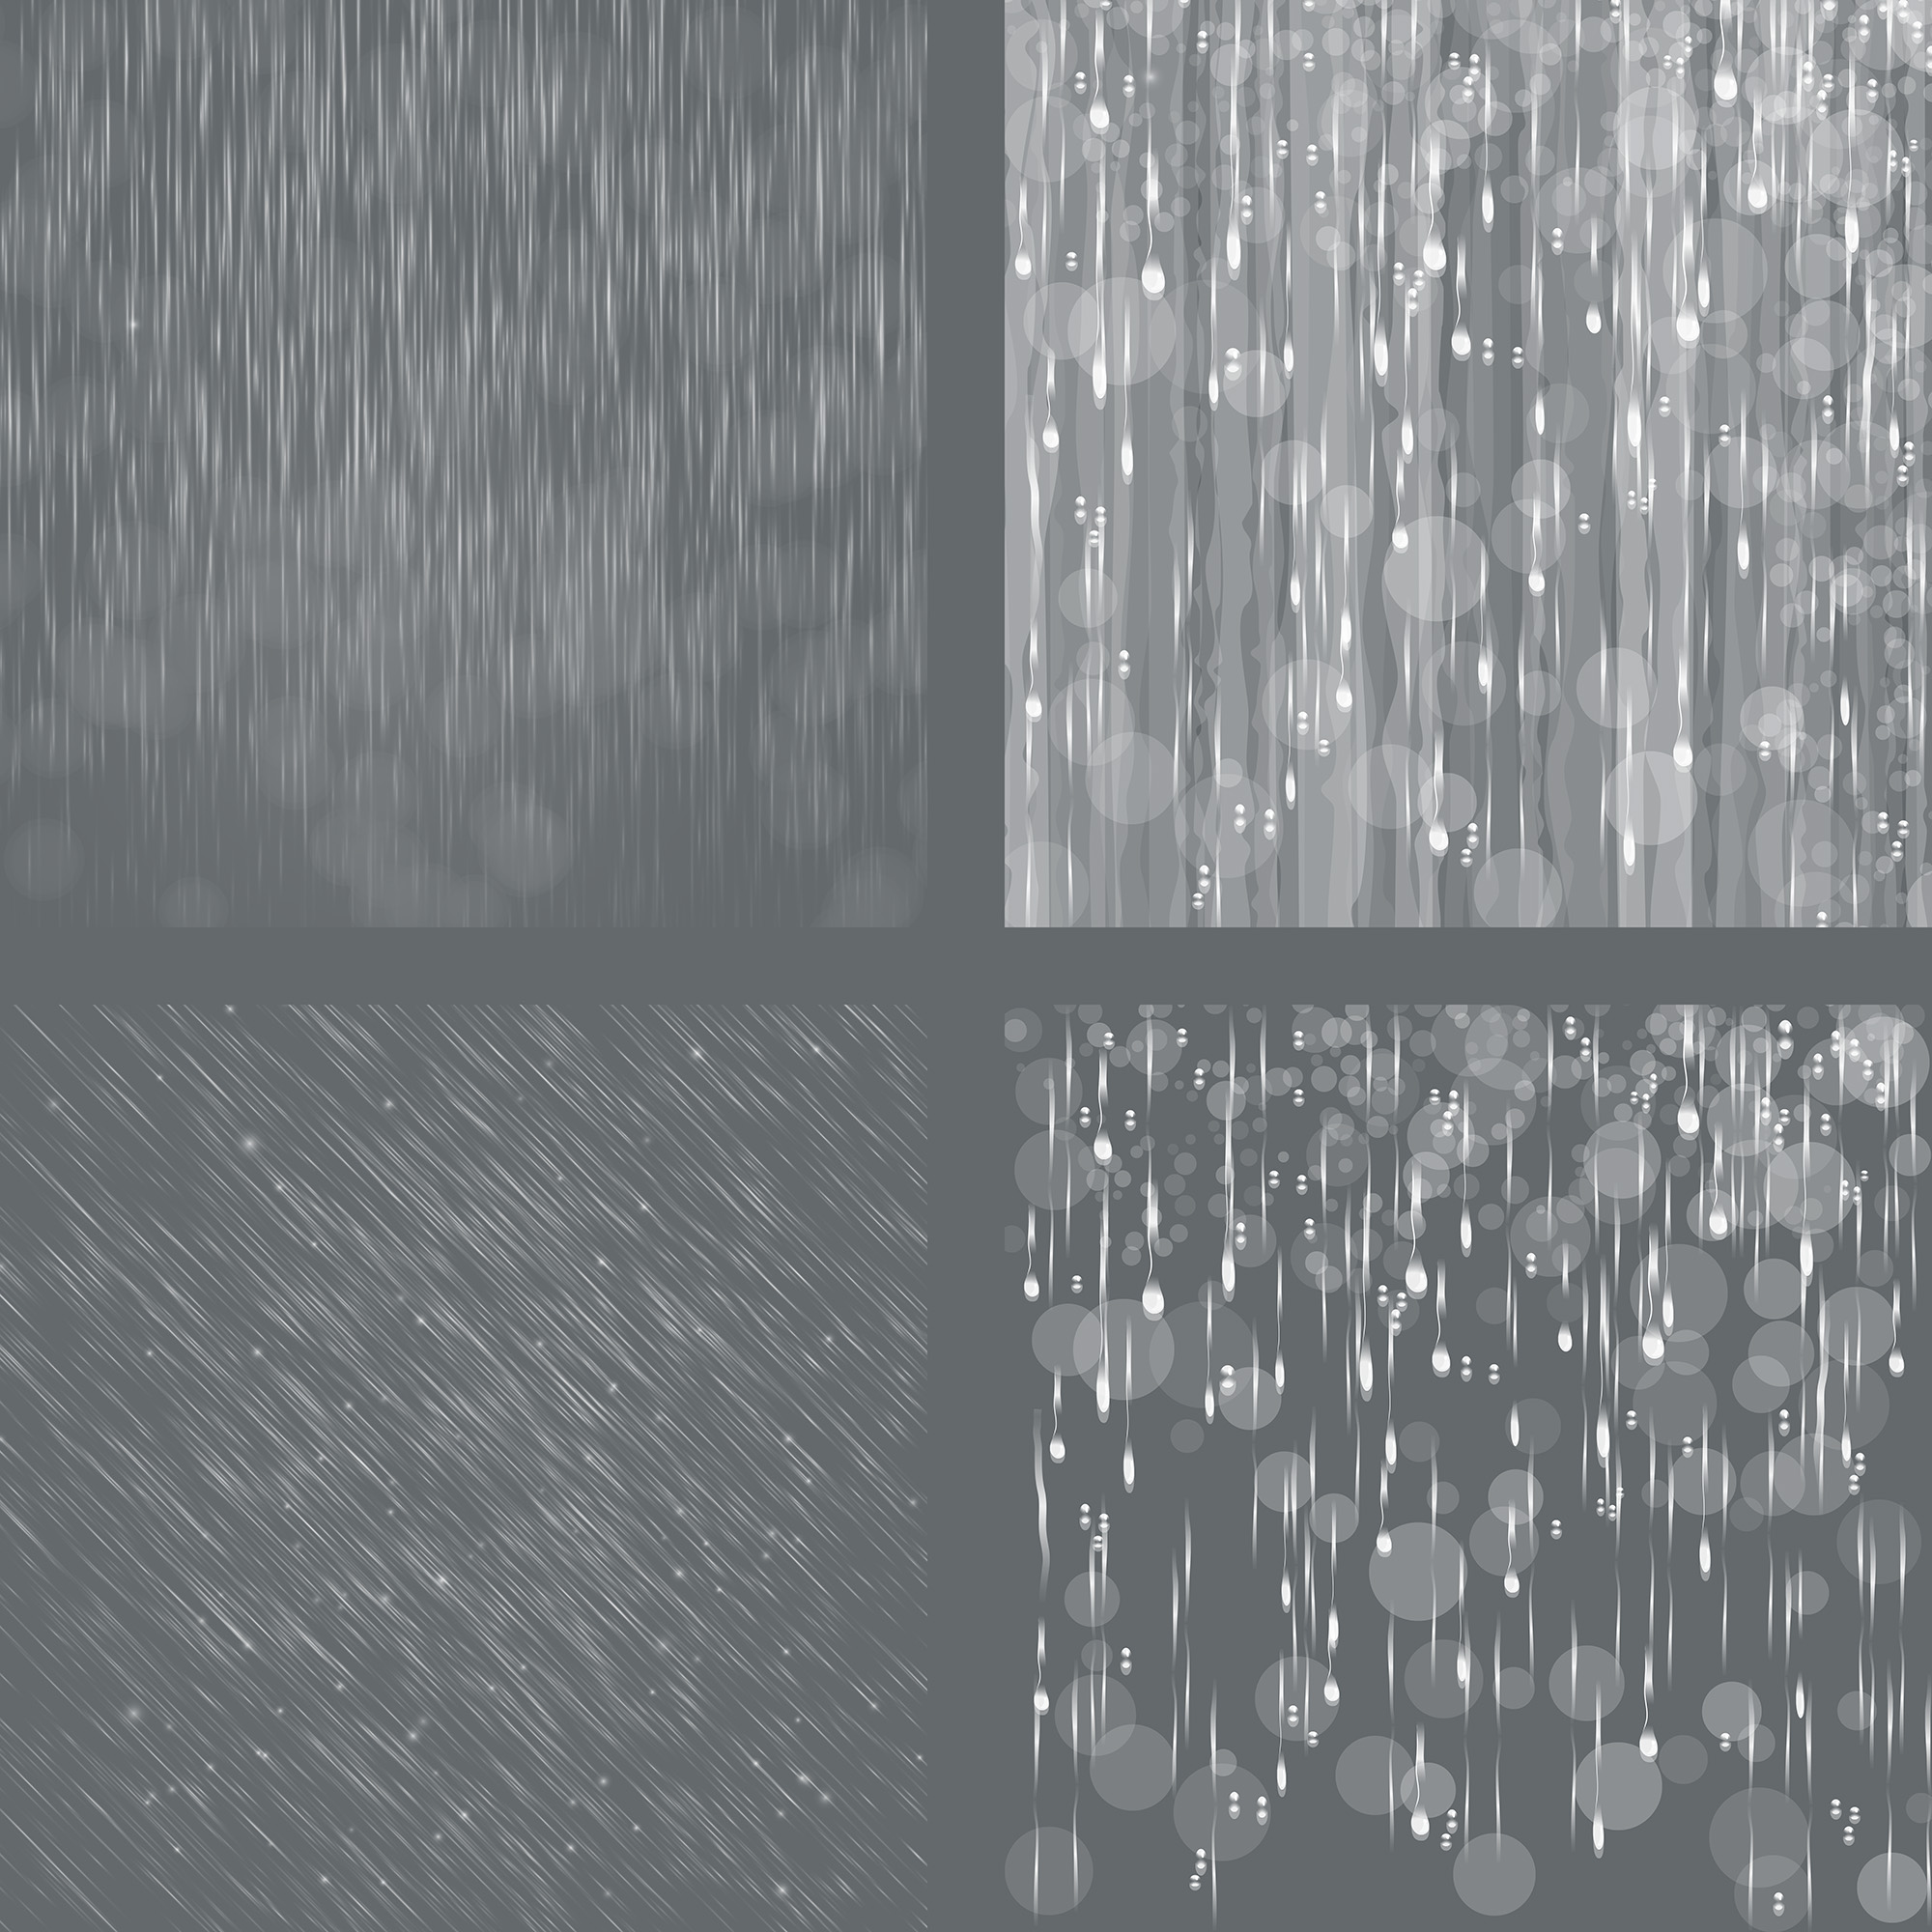 Rain Overlays Clipart, Falling Rain, Photoshop Overlays example image 5